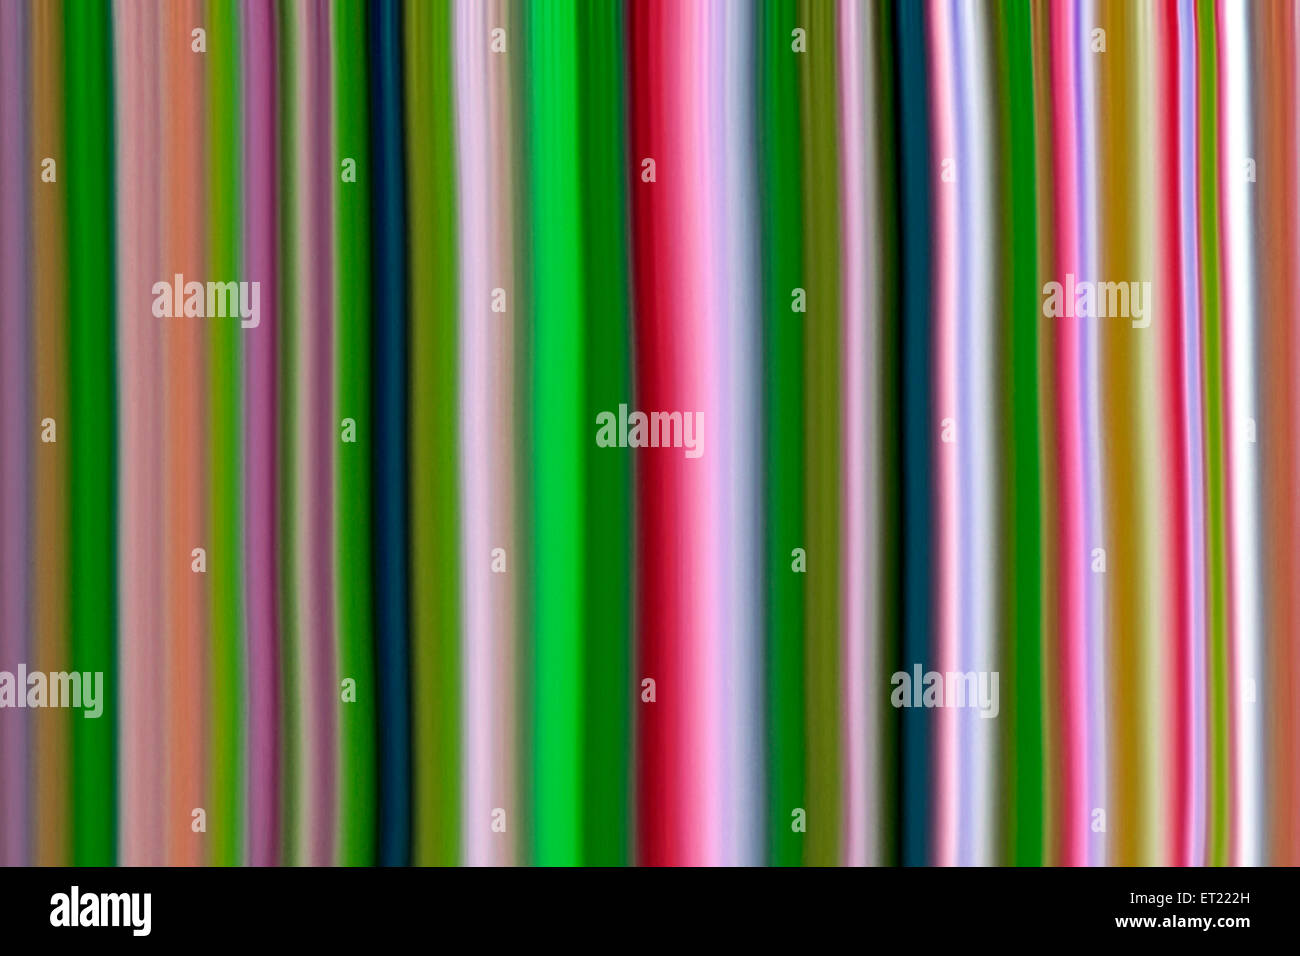 Moderne Kunst Computer digitale Grafiken Farben Linie Stockbild